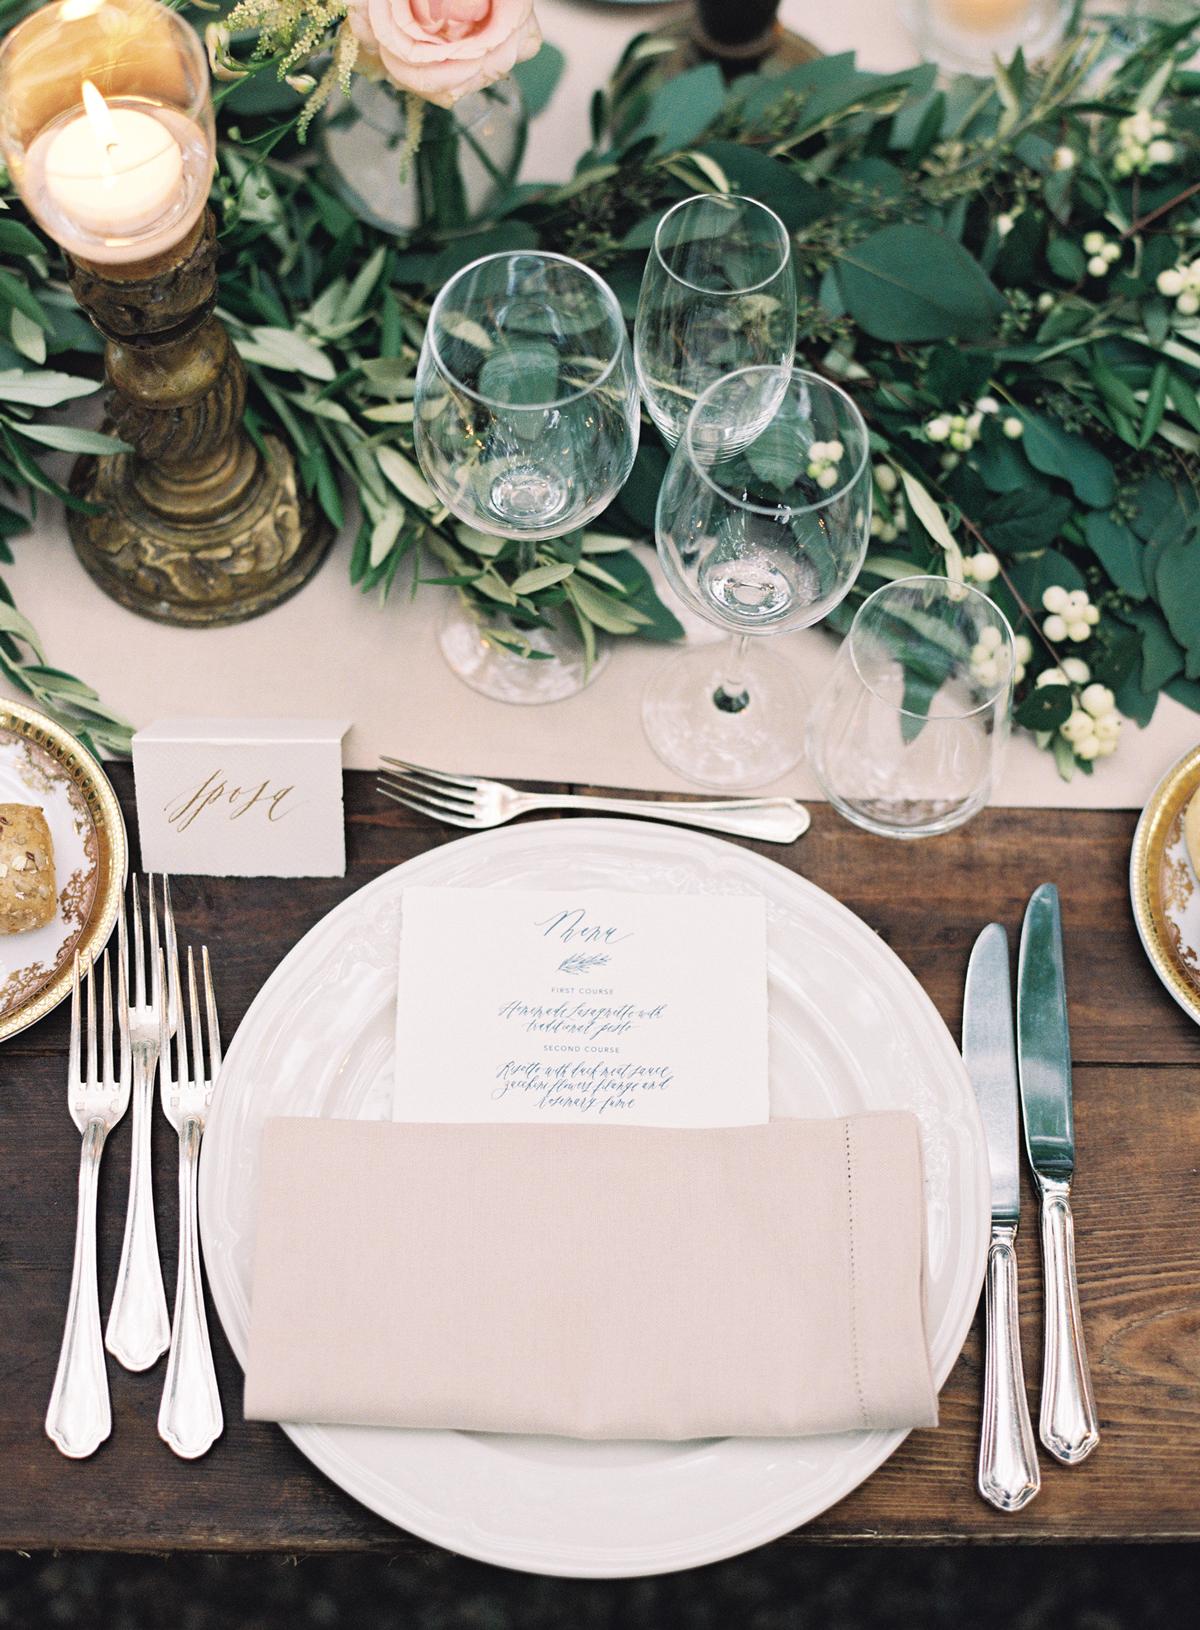 wedding reception napkin folds beige napkin in rectangular fold